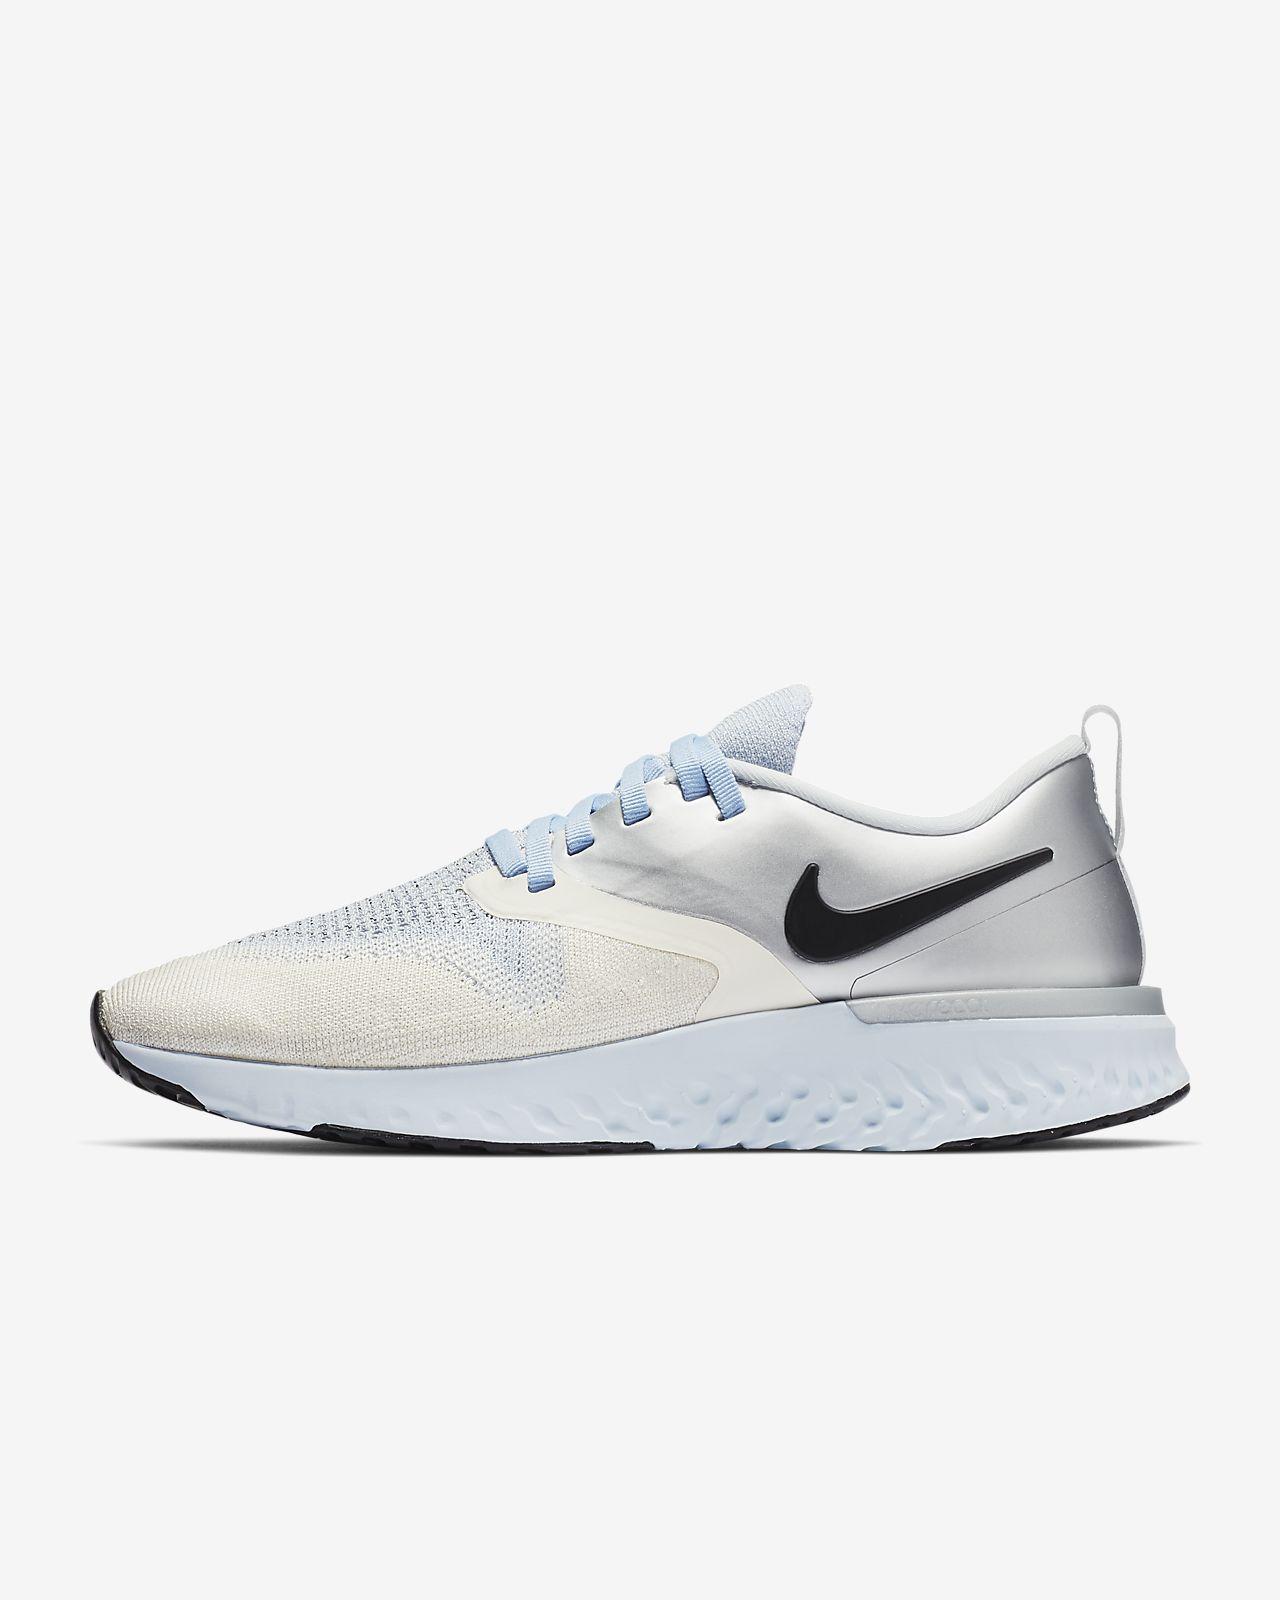 Nike Odyssey React Flyknit 2 Premium-løbesko til kvinder